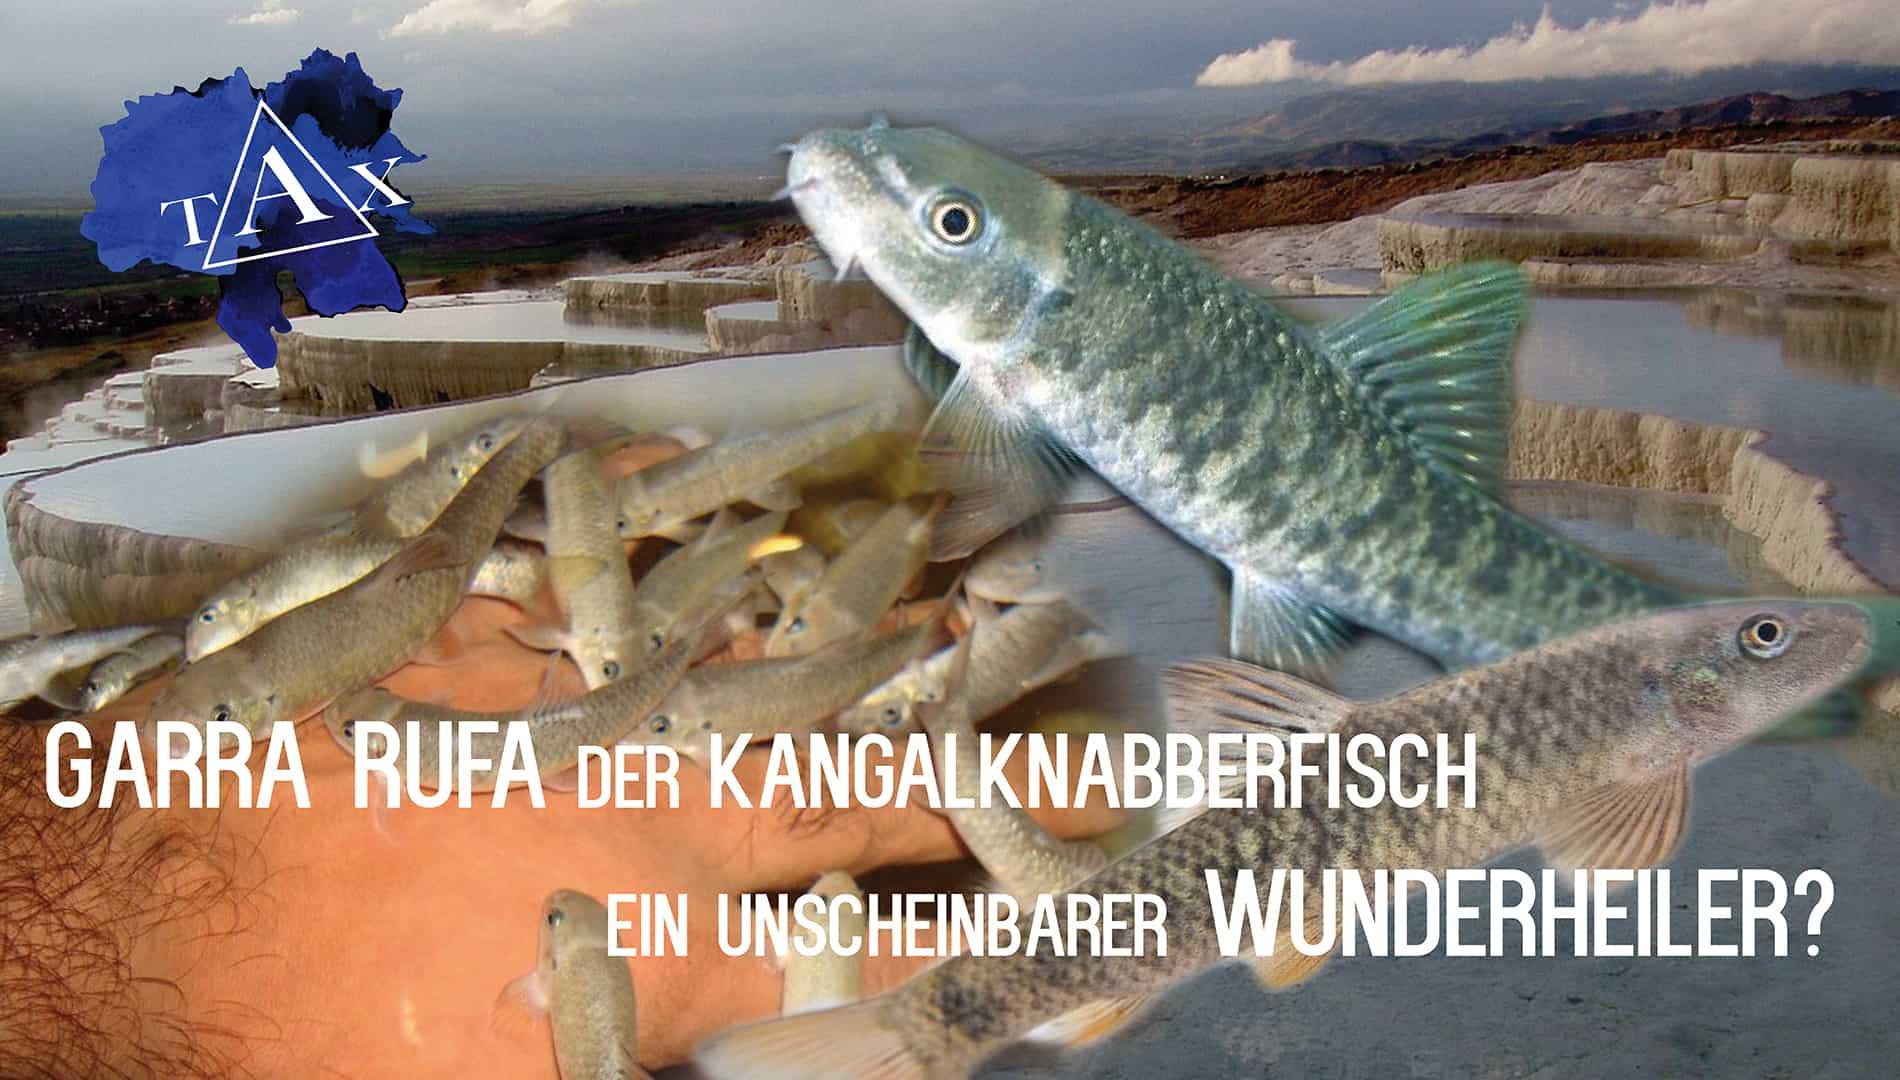 Tobis Aquaristikexzesse Video Tipp: Garra rufa Der Kangalknabberfisch